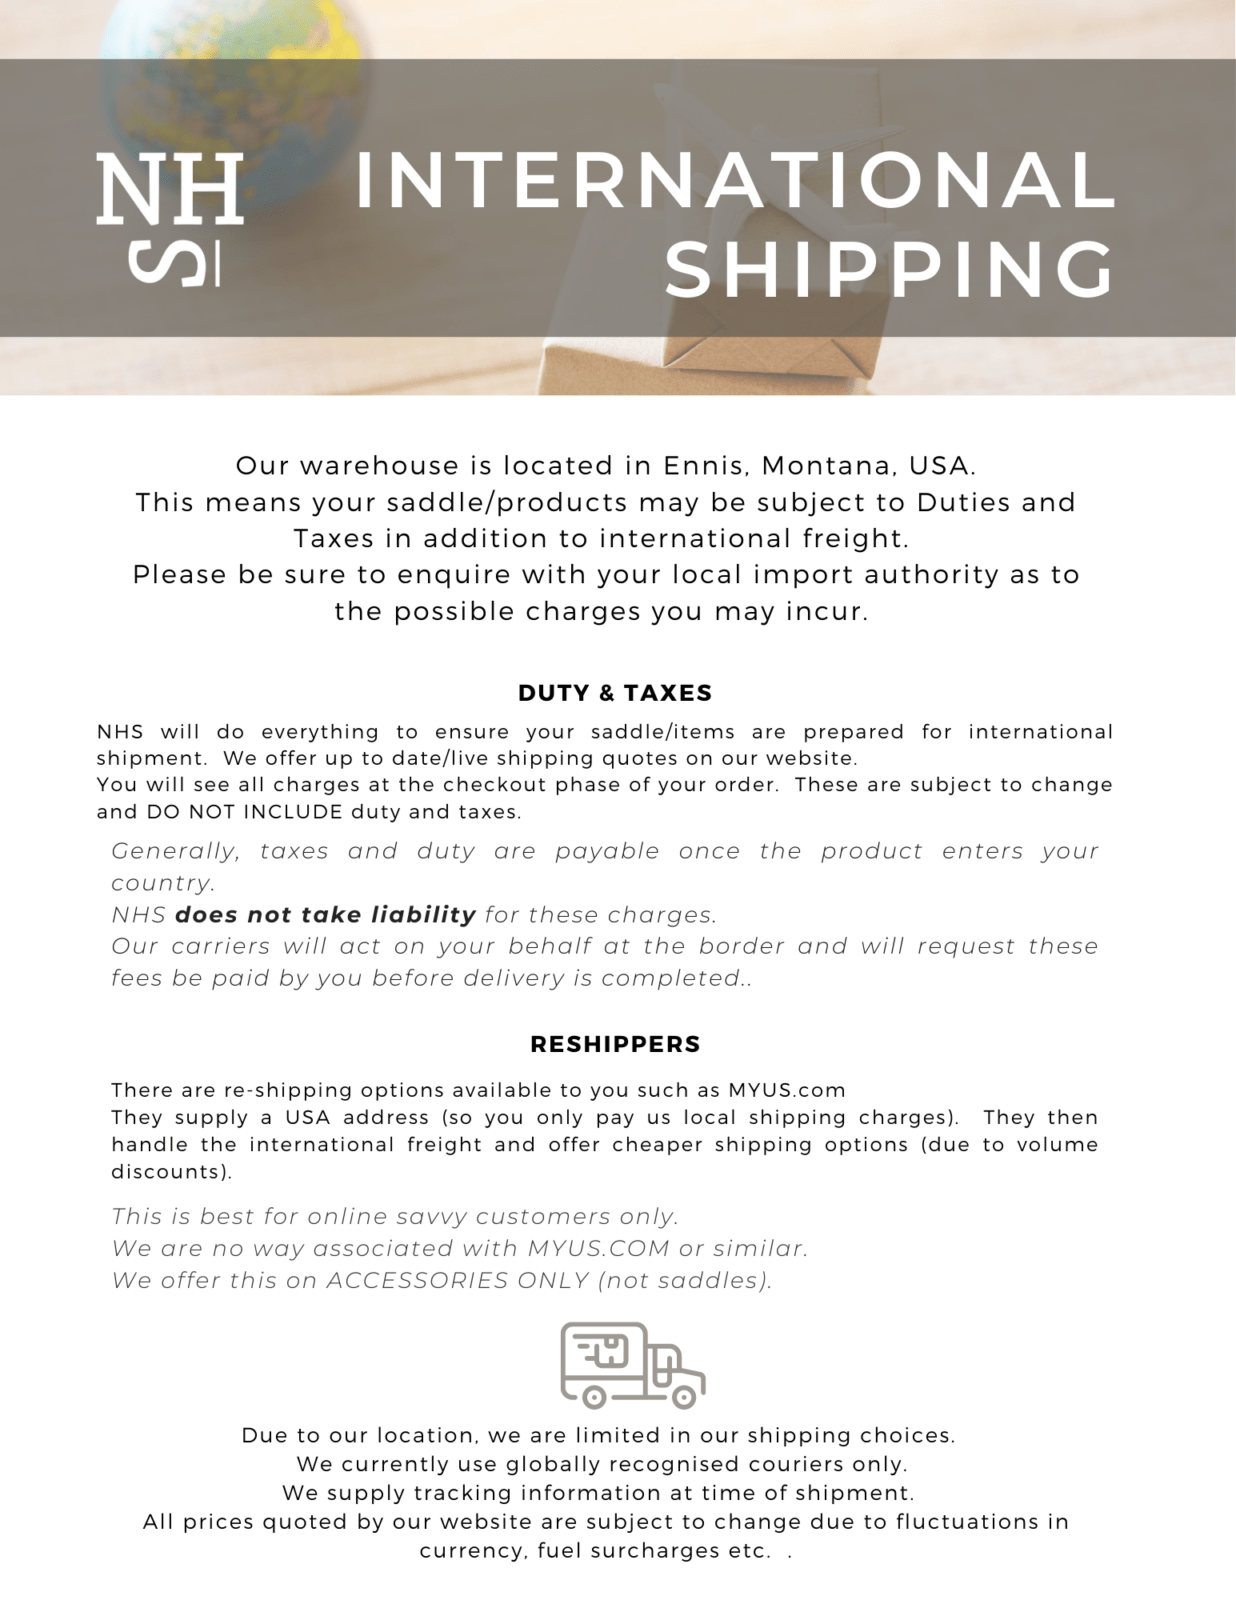 Inernational shipping